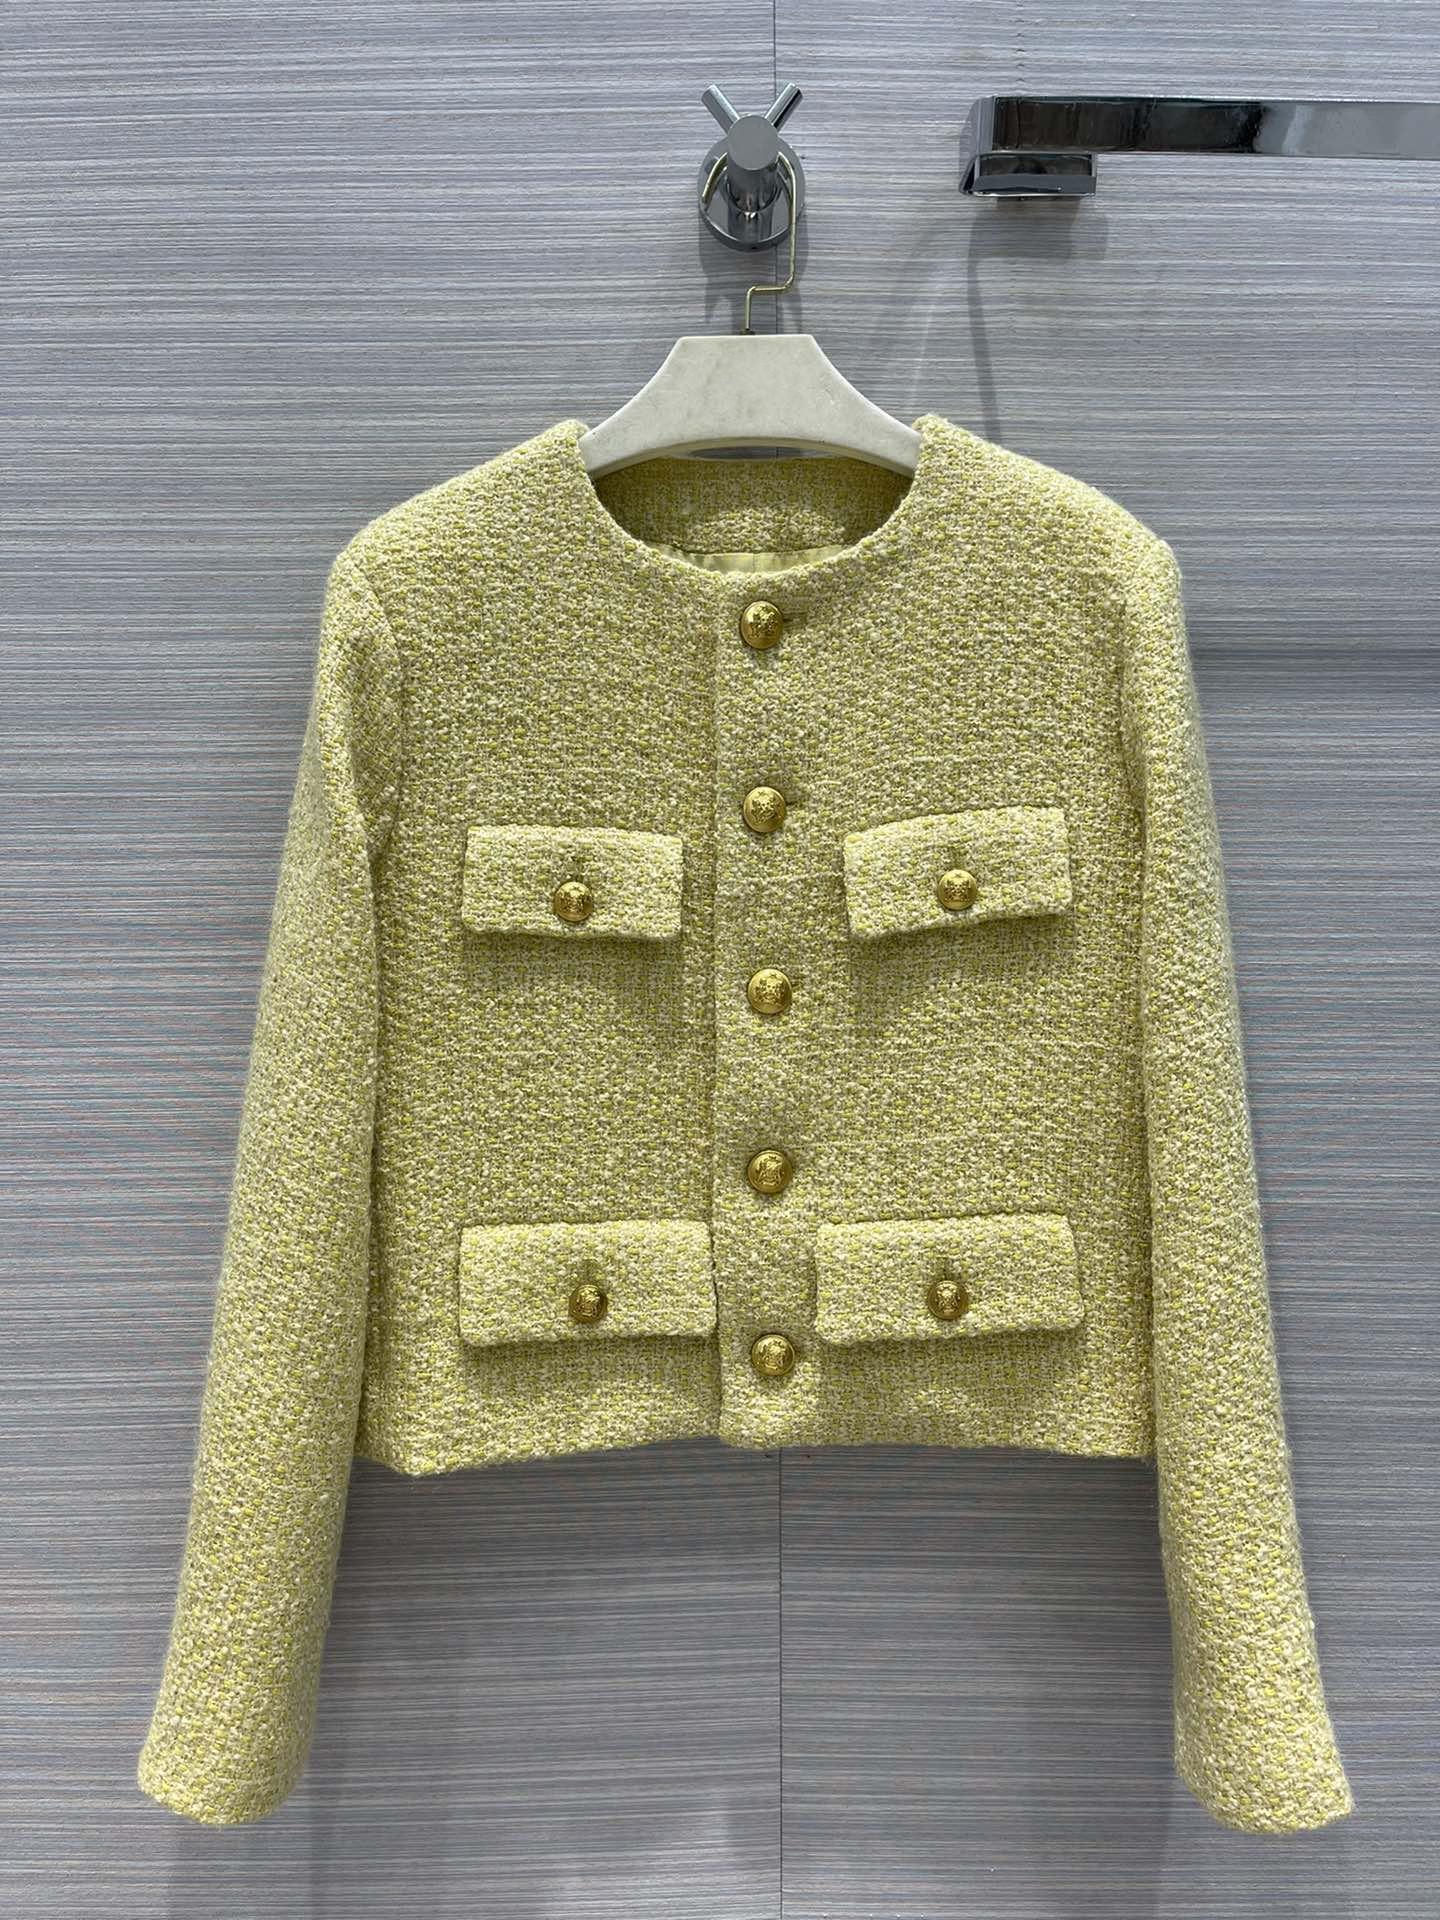 Milan Runway Coats 2021 Long Sleeve Panelled Women's Coats Designer Coats Brand Same Style Jackets 0403-6